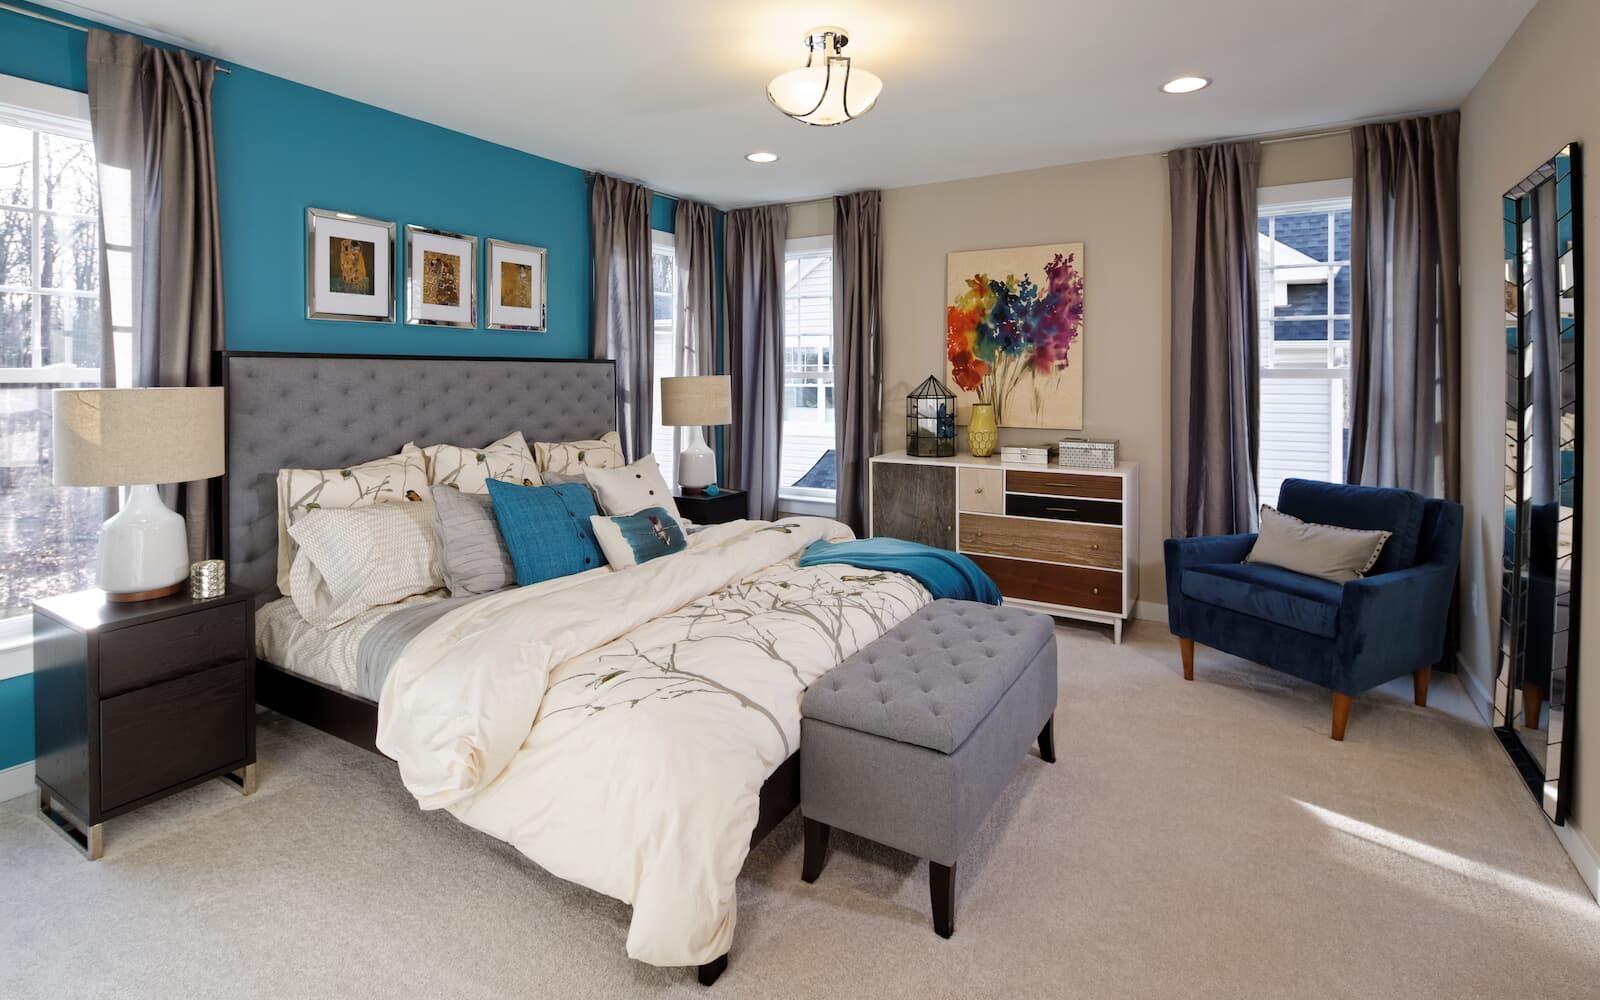 Bedroom featured in the Van Gogh By Brookfield Residential in Sussex, DE